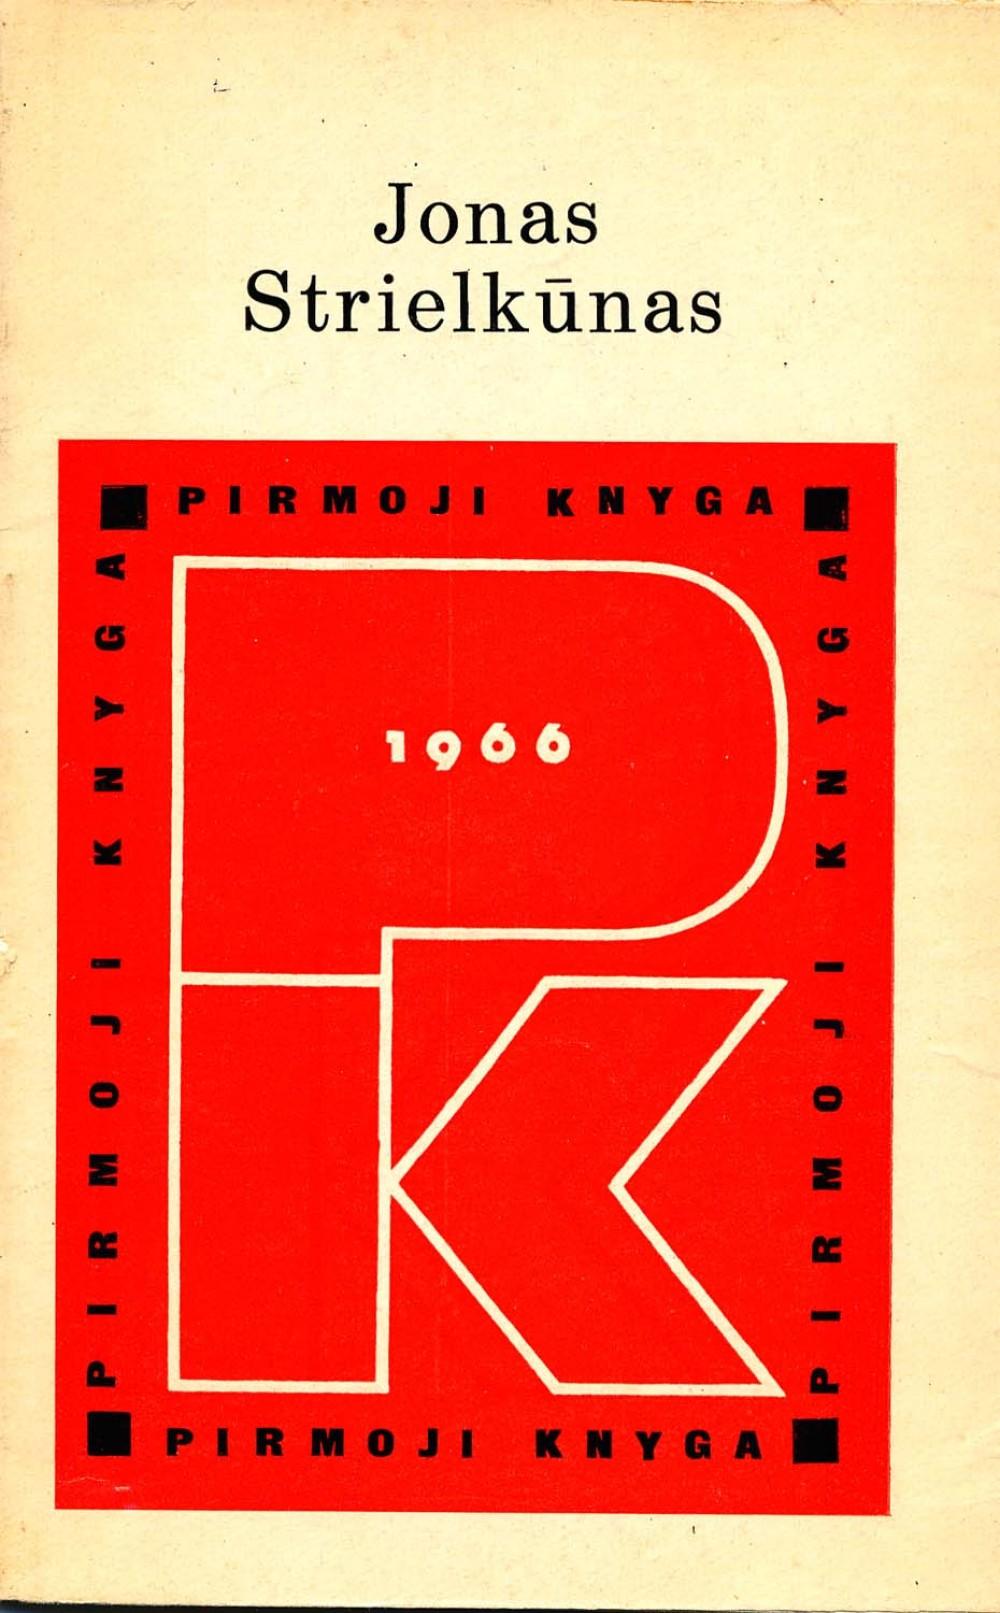 1966 m.